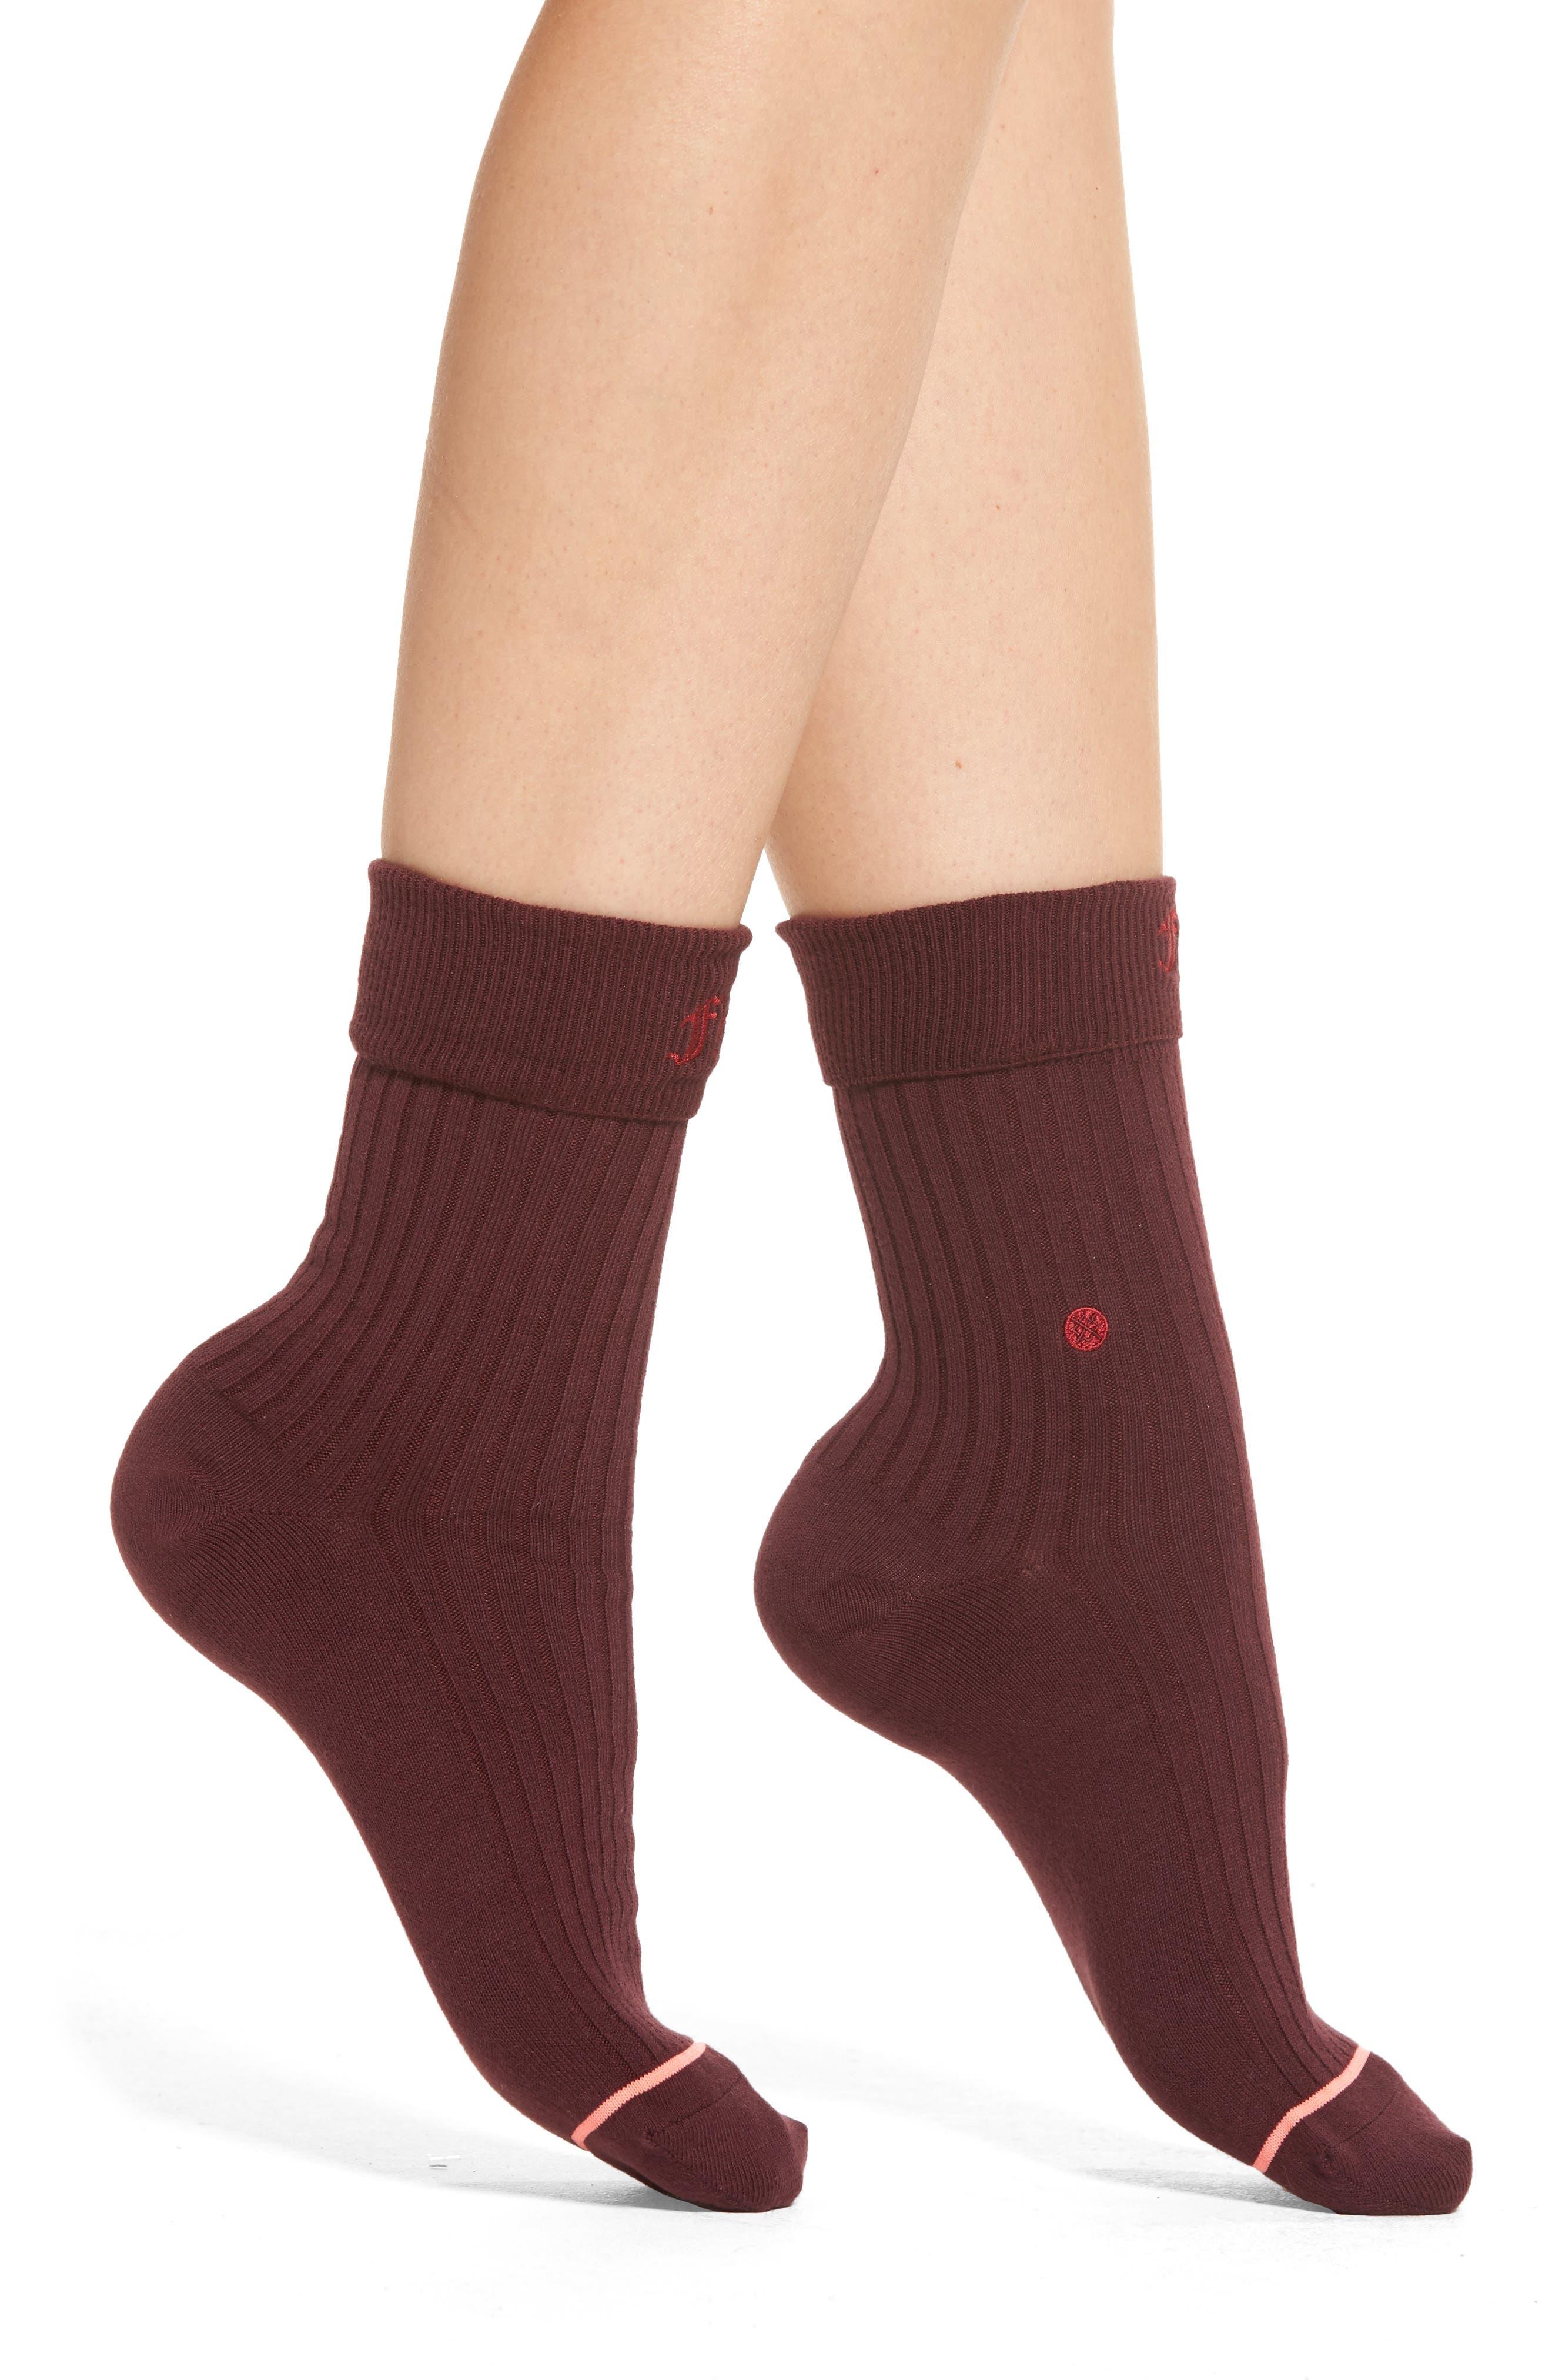 Stance x Rihanna Fenty Prep Crew Socks